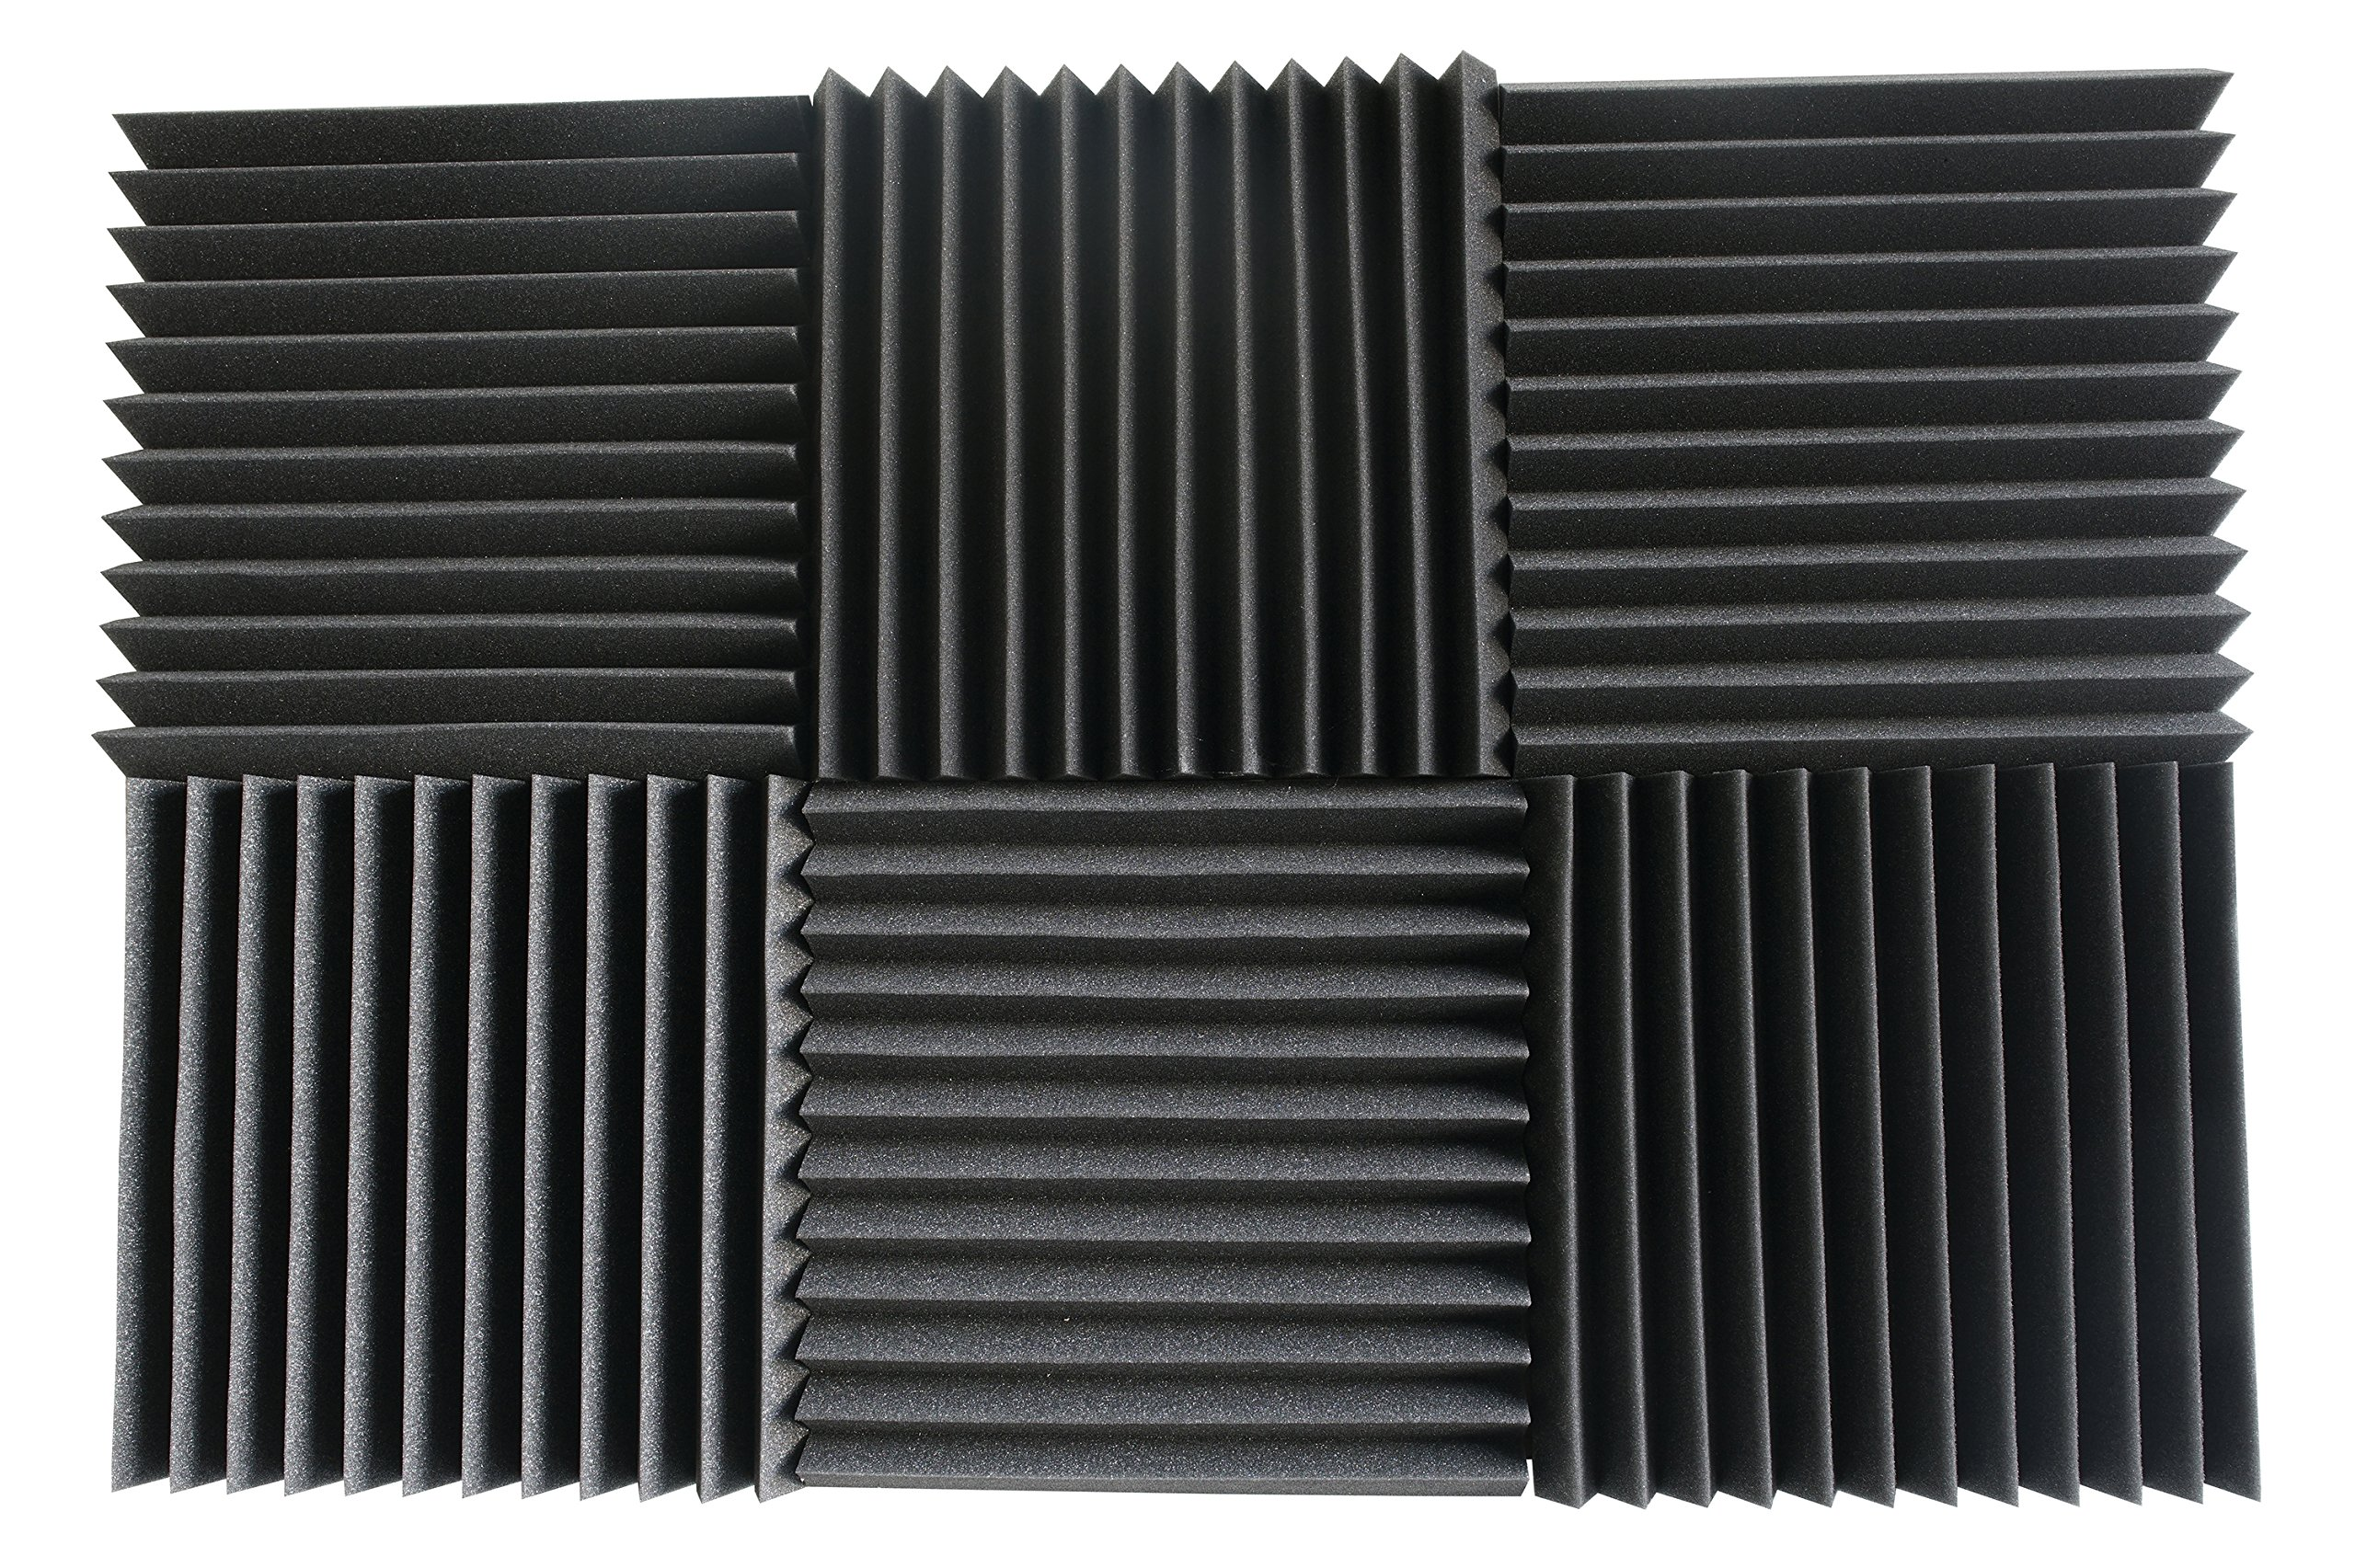 6 Pack- Acoustic Panels Studio Foam Wedges 2'' X 12'' X 12'' by Foamily (Image #3)